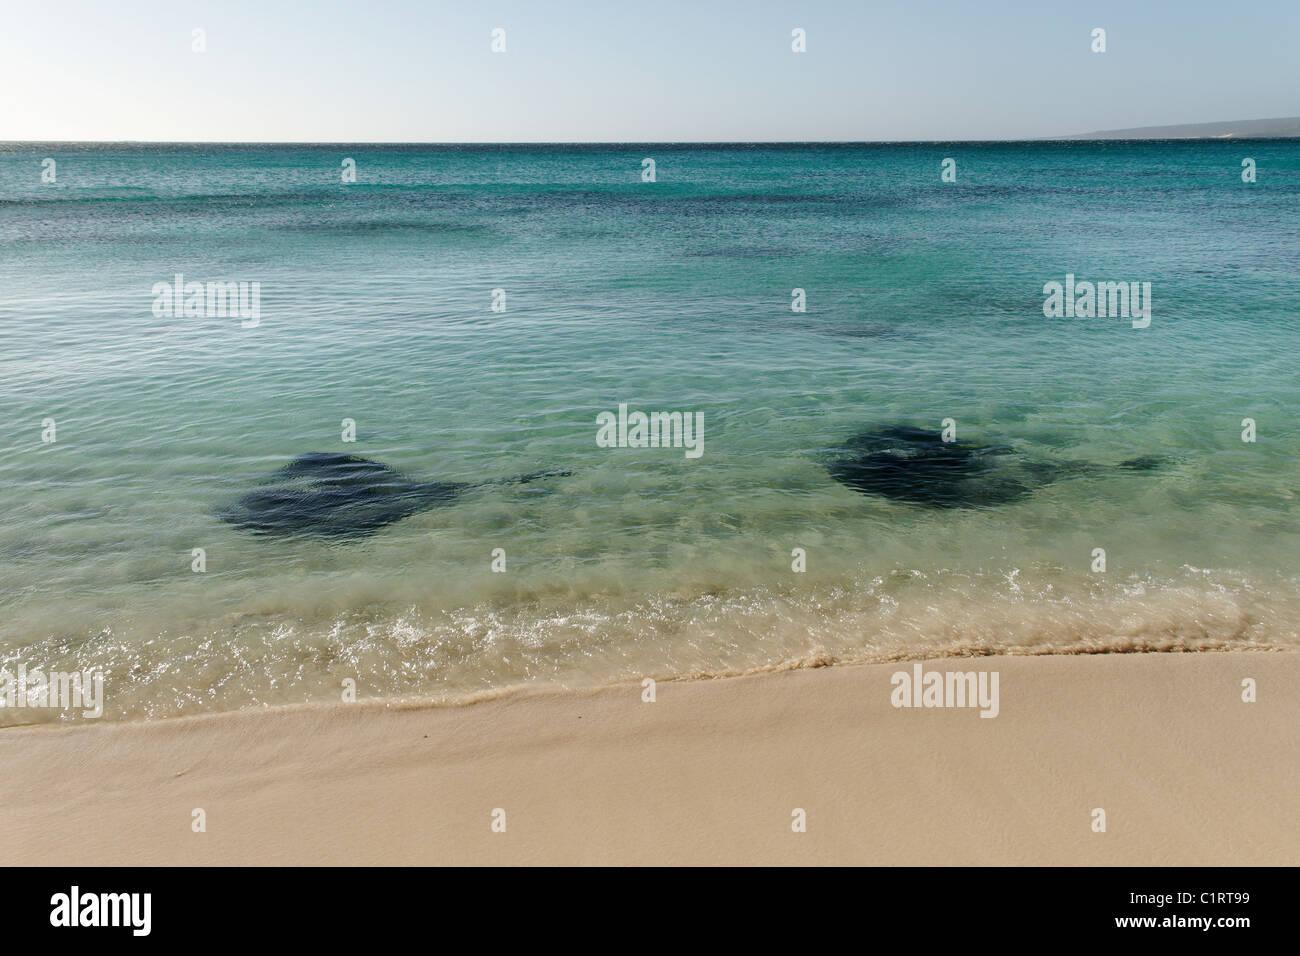 2 Stingrays, Hamelin Bay, Augusta Southwest Australia - Stock Image